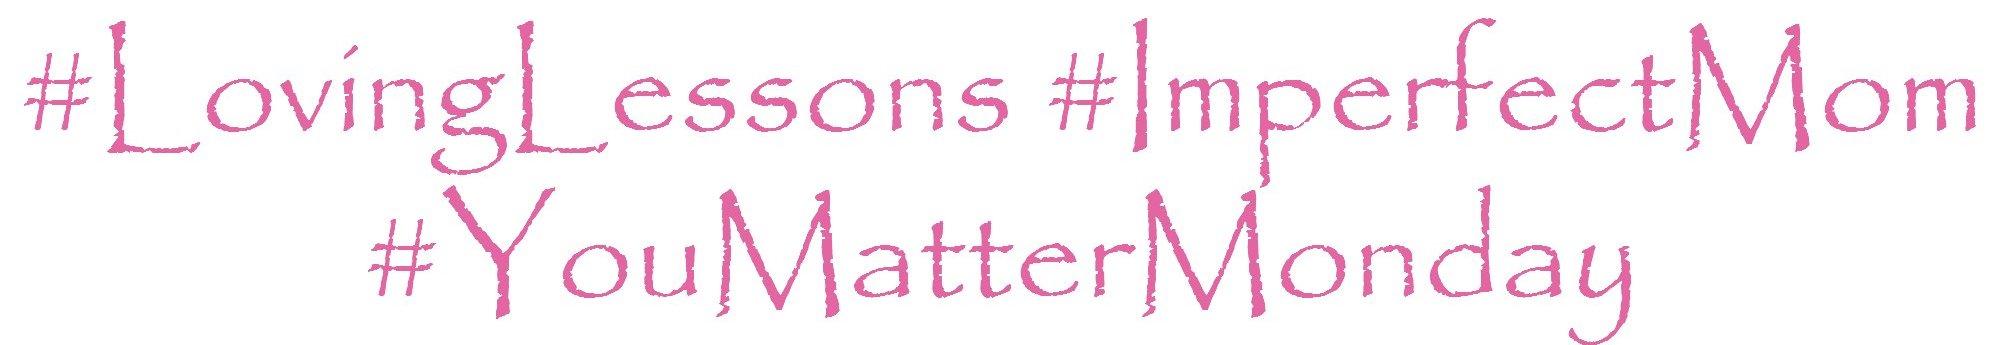 You-Matter-Monday-Hashtag-Loving-Lessons